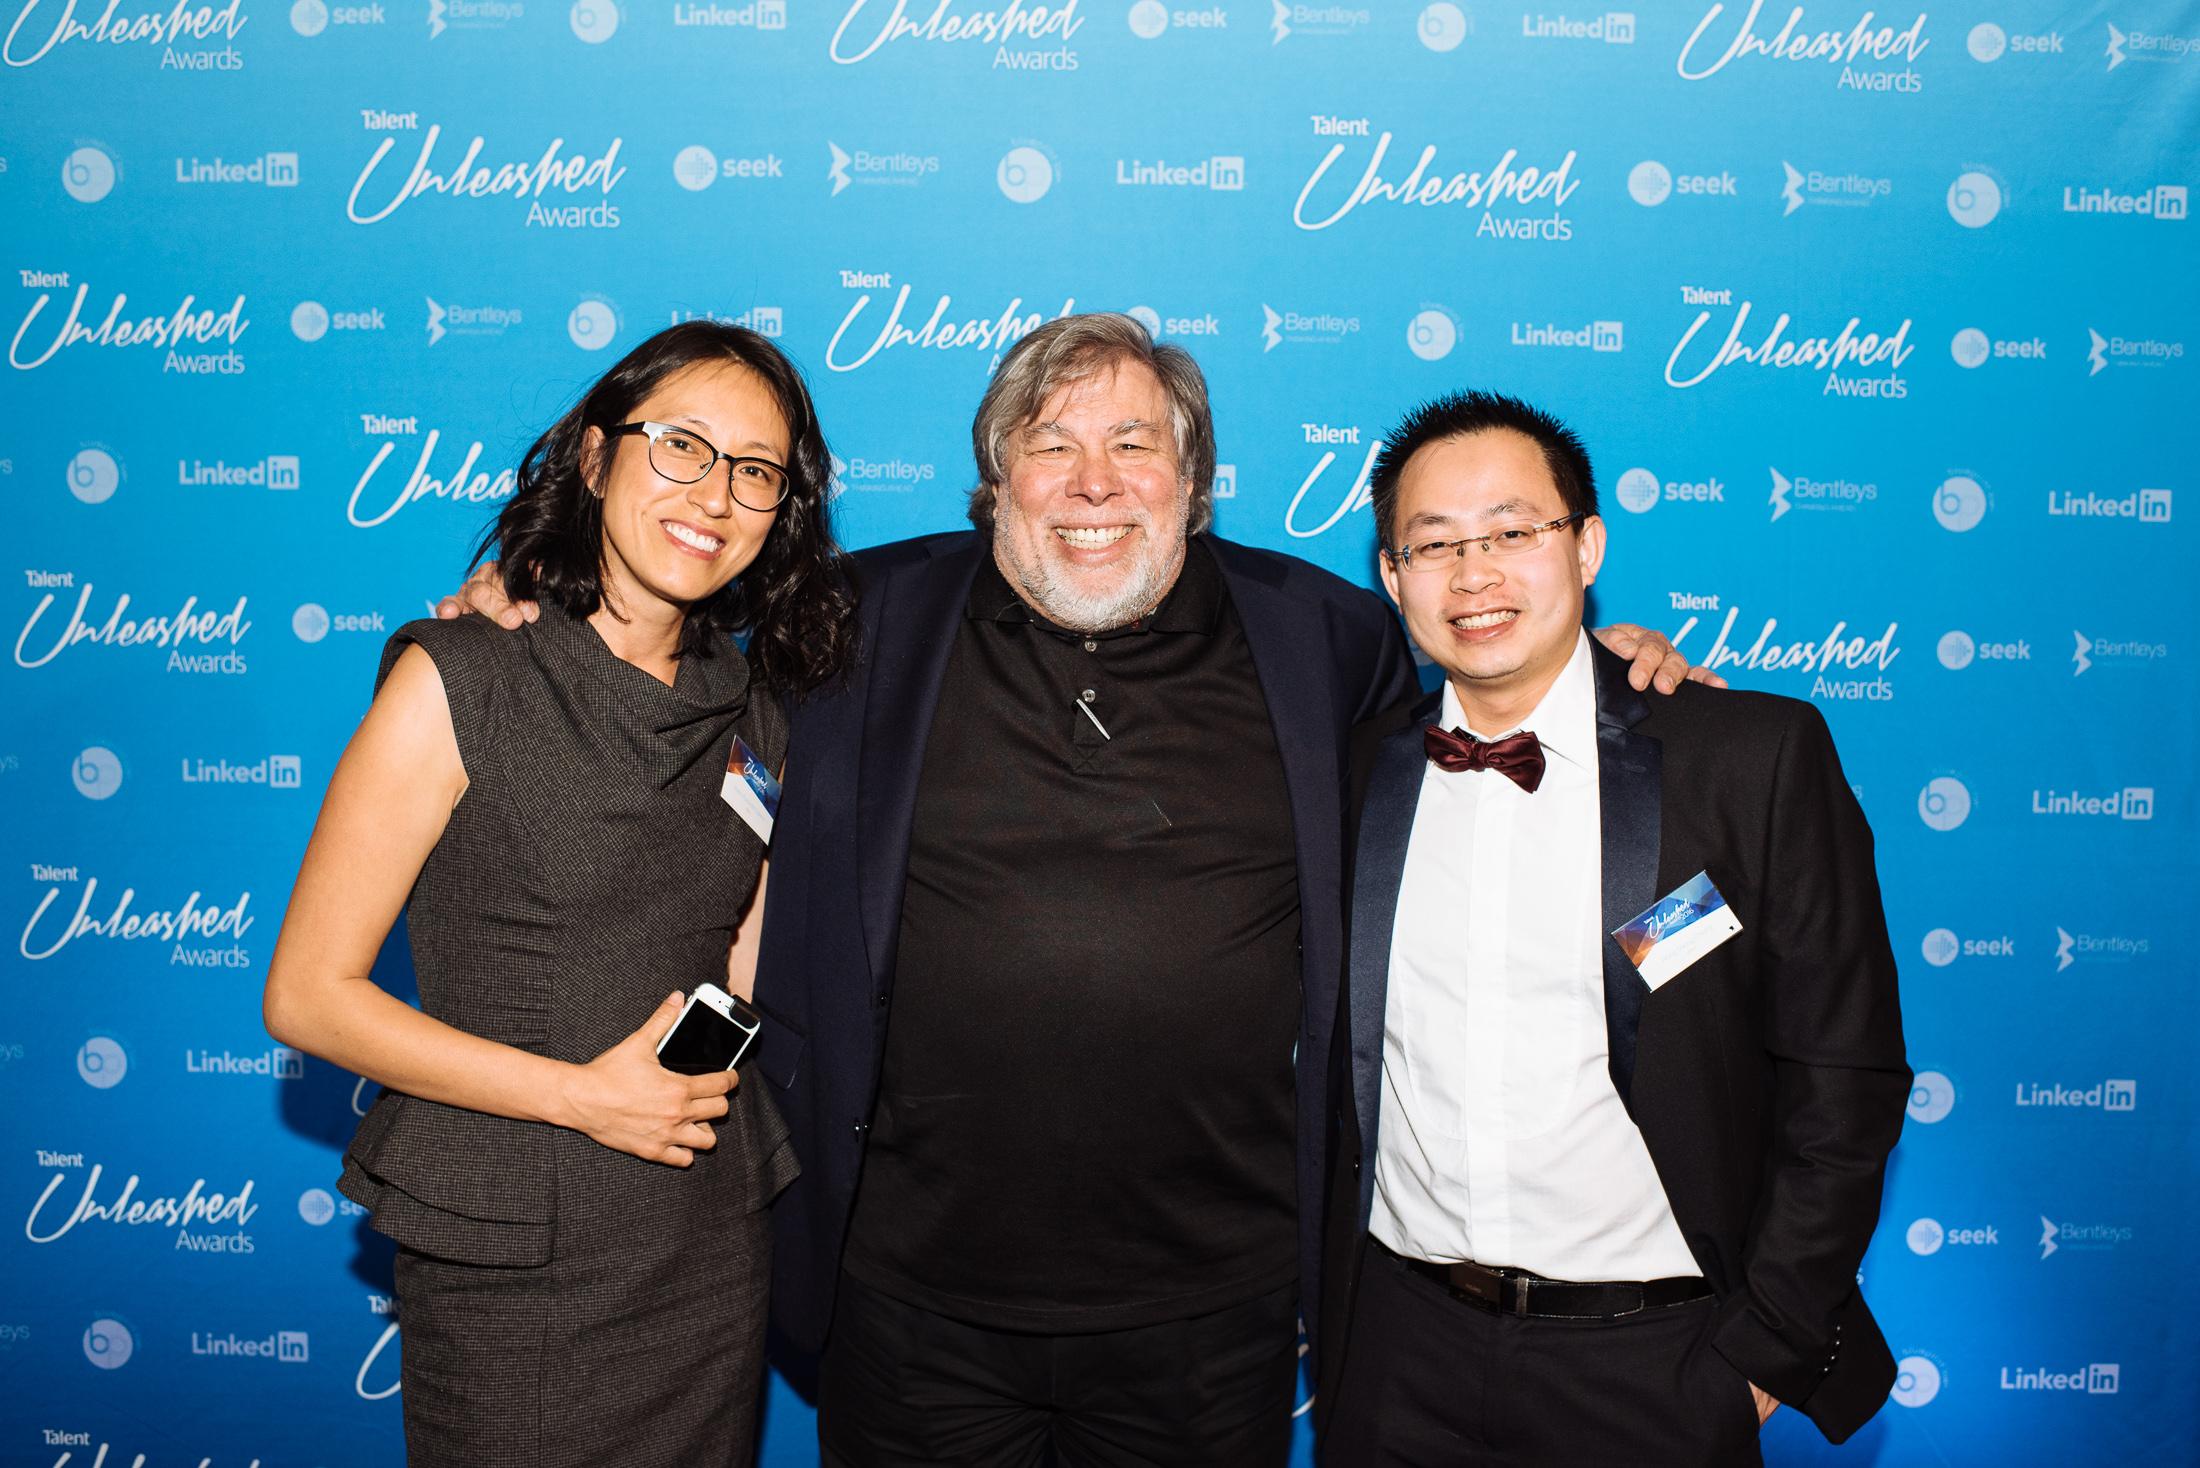 oDocs' Hanna Eastvold-Edwins and Dr Hong Sheng Chiong with Steve Wozniak